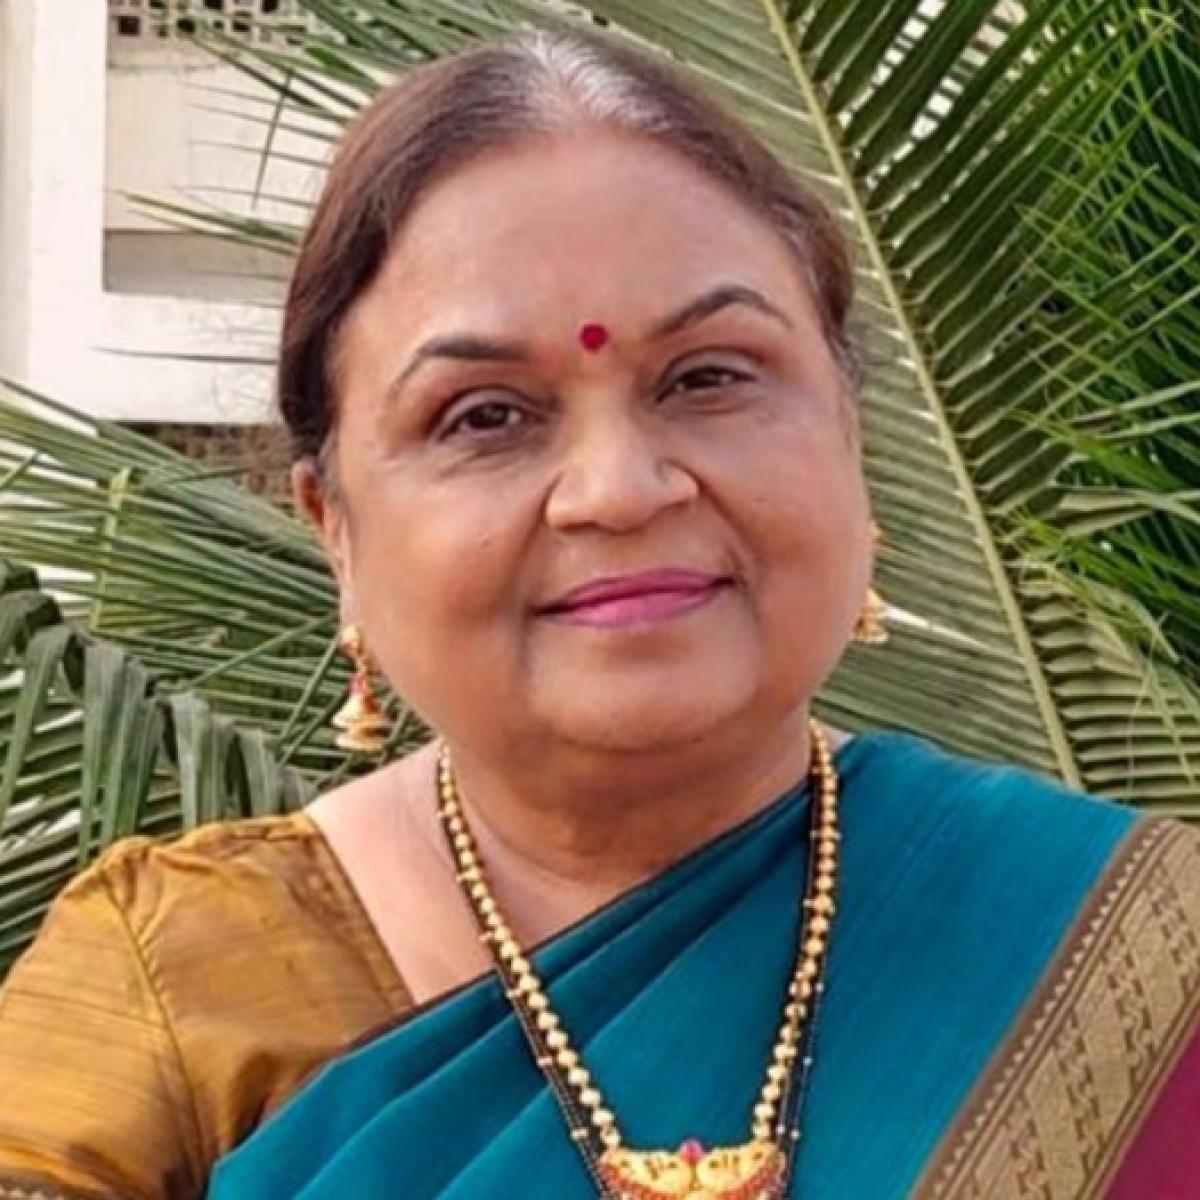 Remembering Neela Satyanarayan - no nonsense diplomat who feared no one